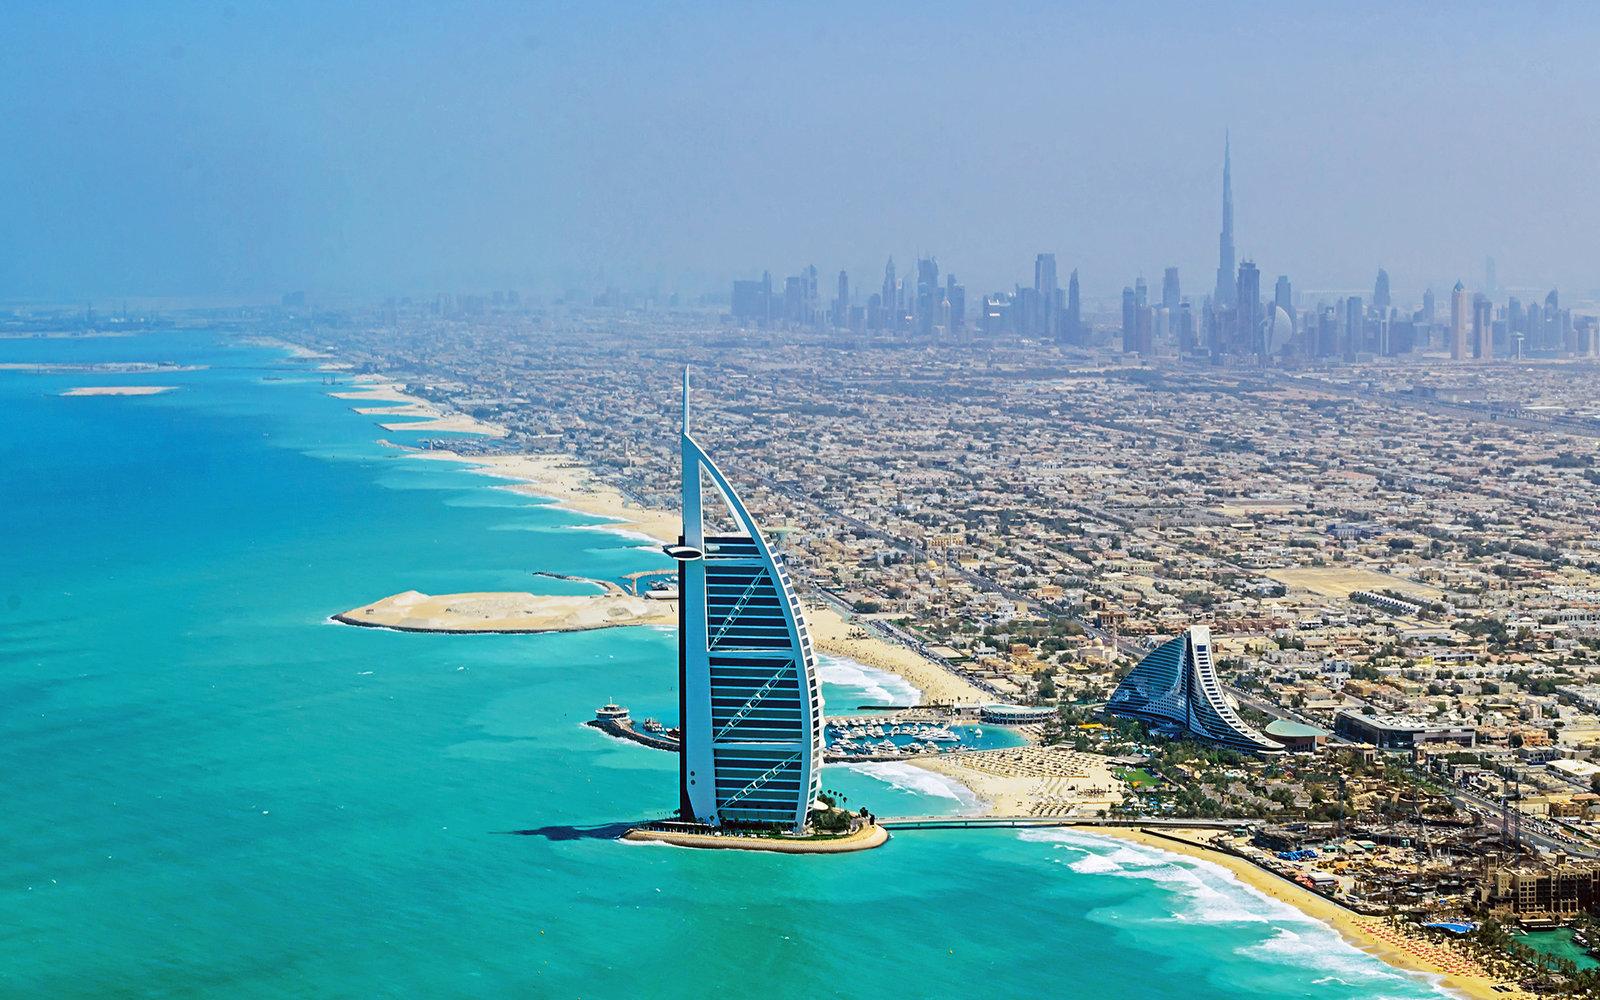 DAY 5 - Dubai - Leisure